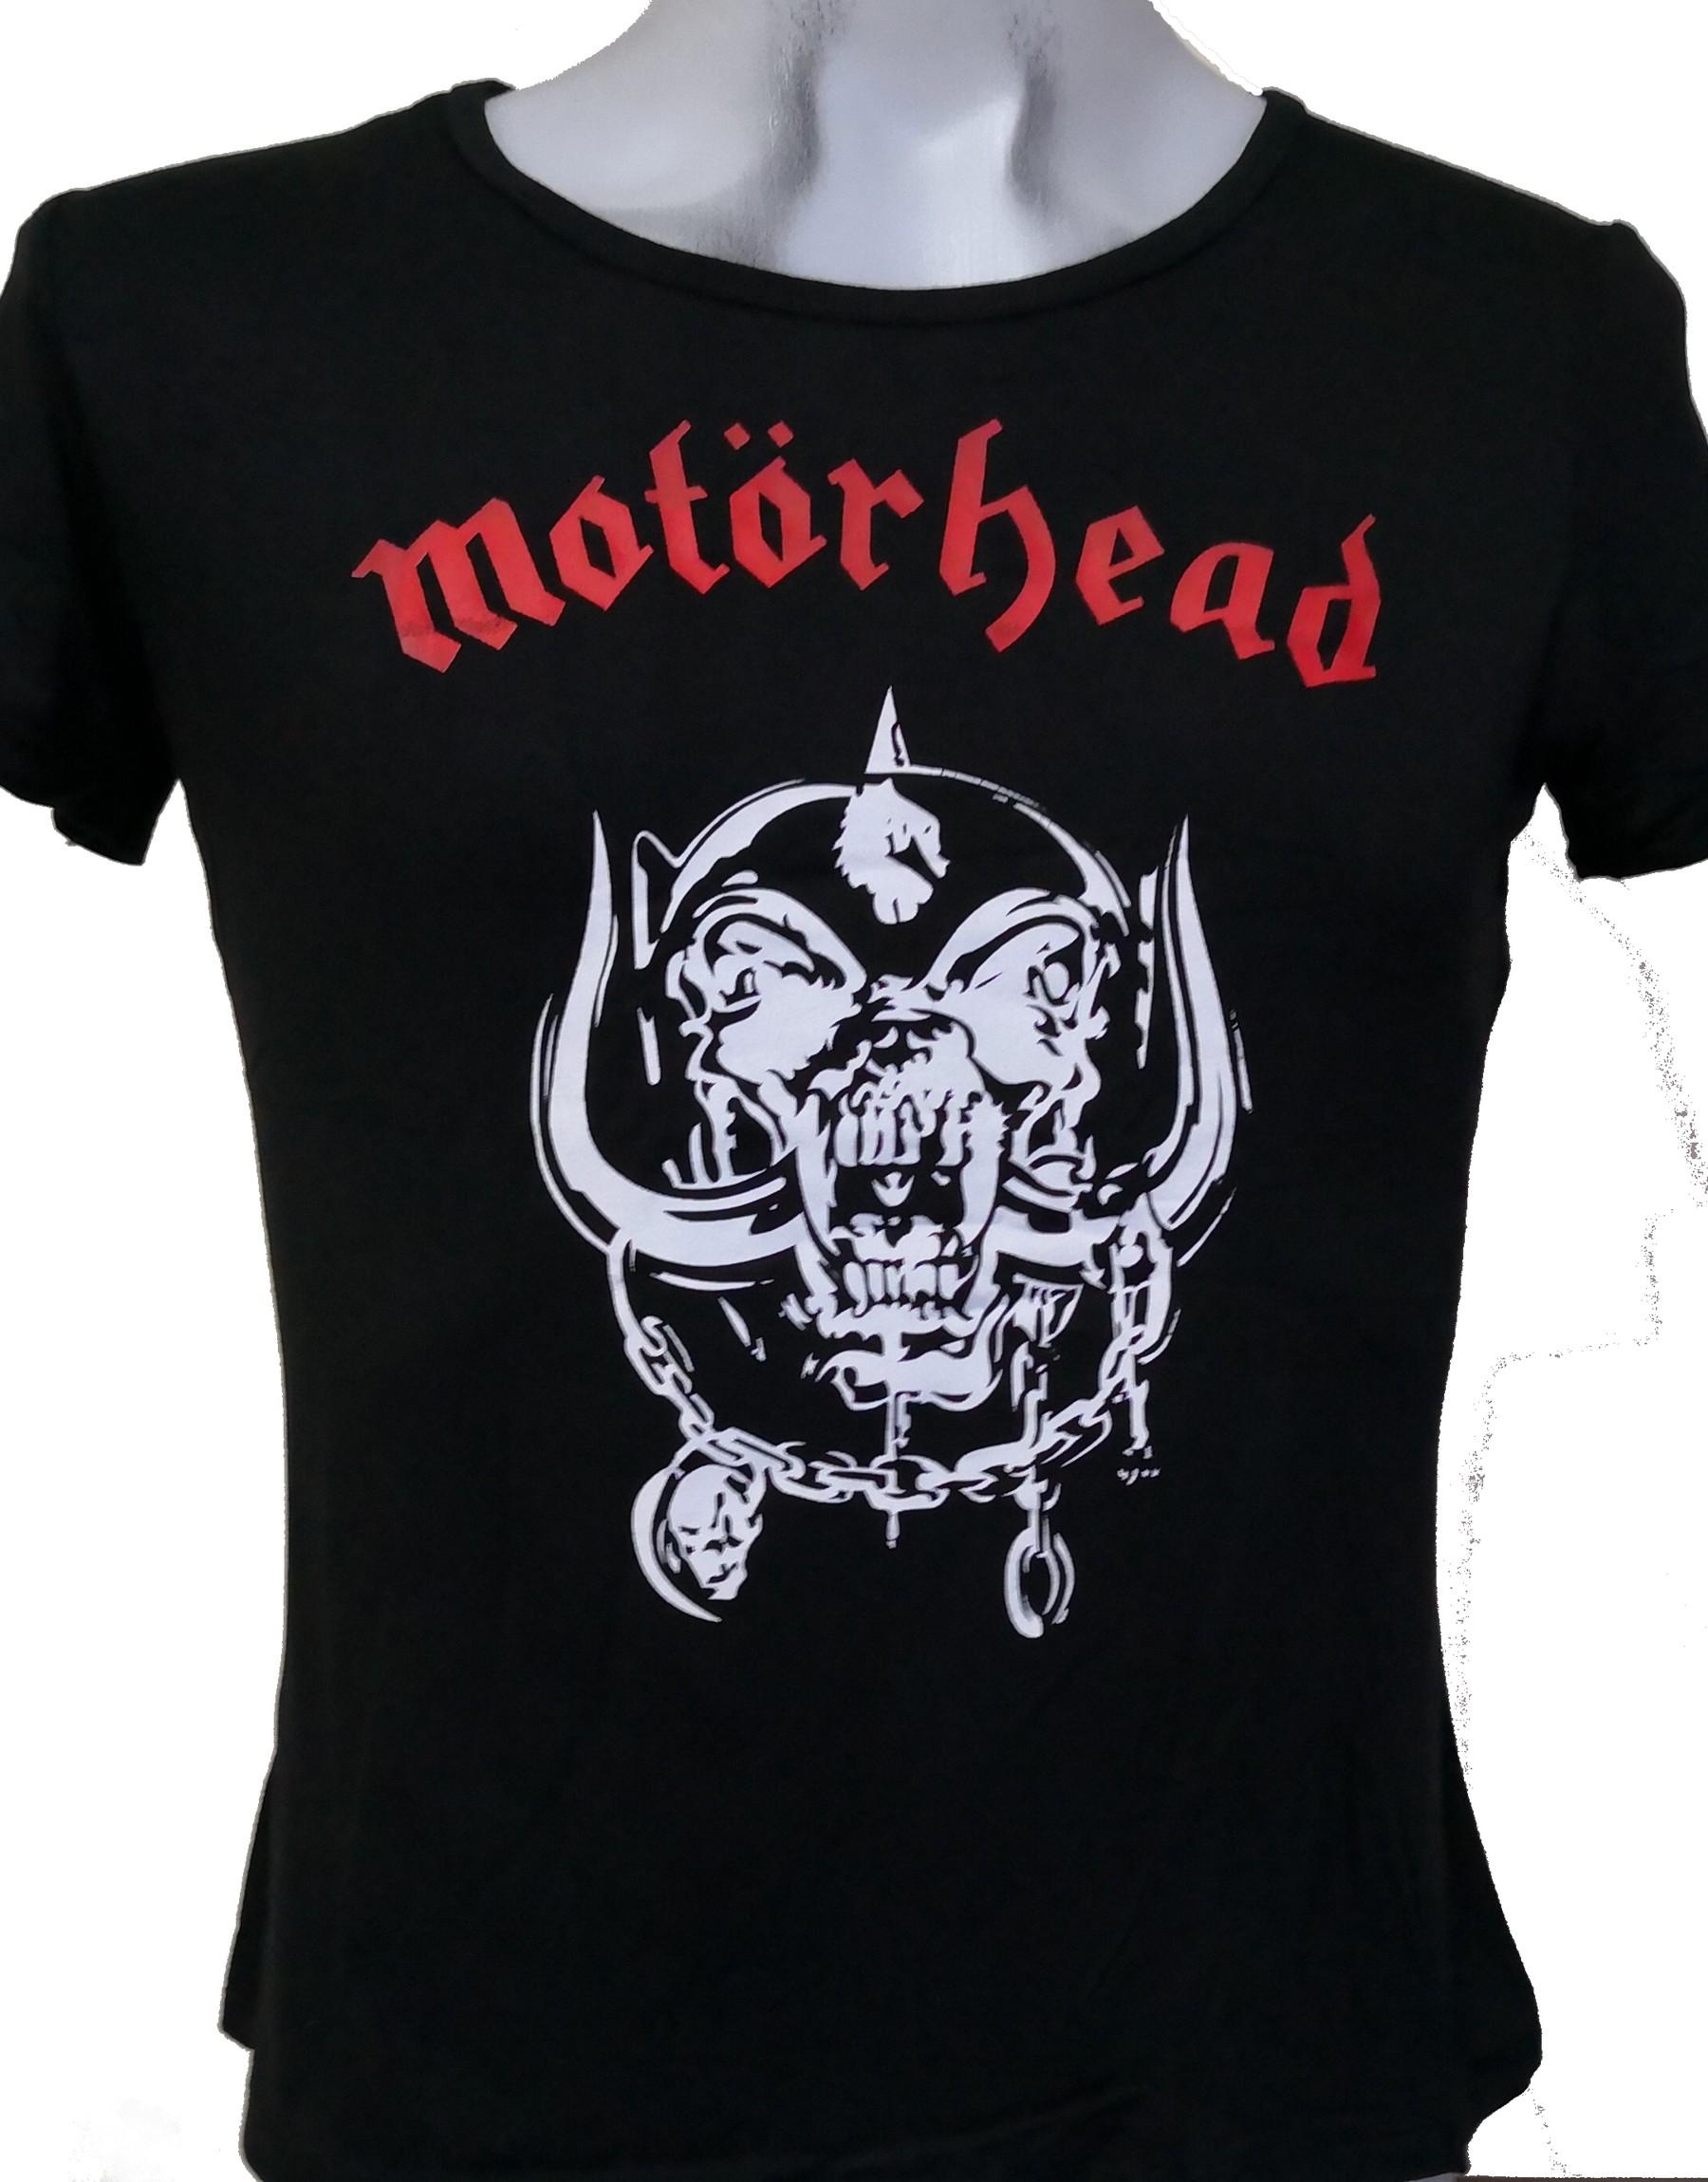 abebd2e91507 Motorhead girly t-shirt size XL – RoxxBKK